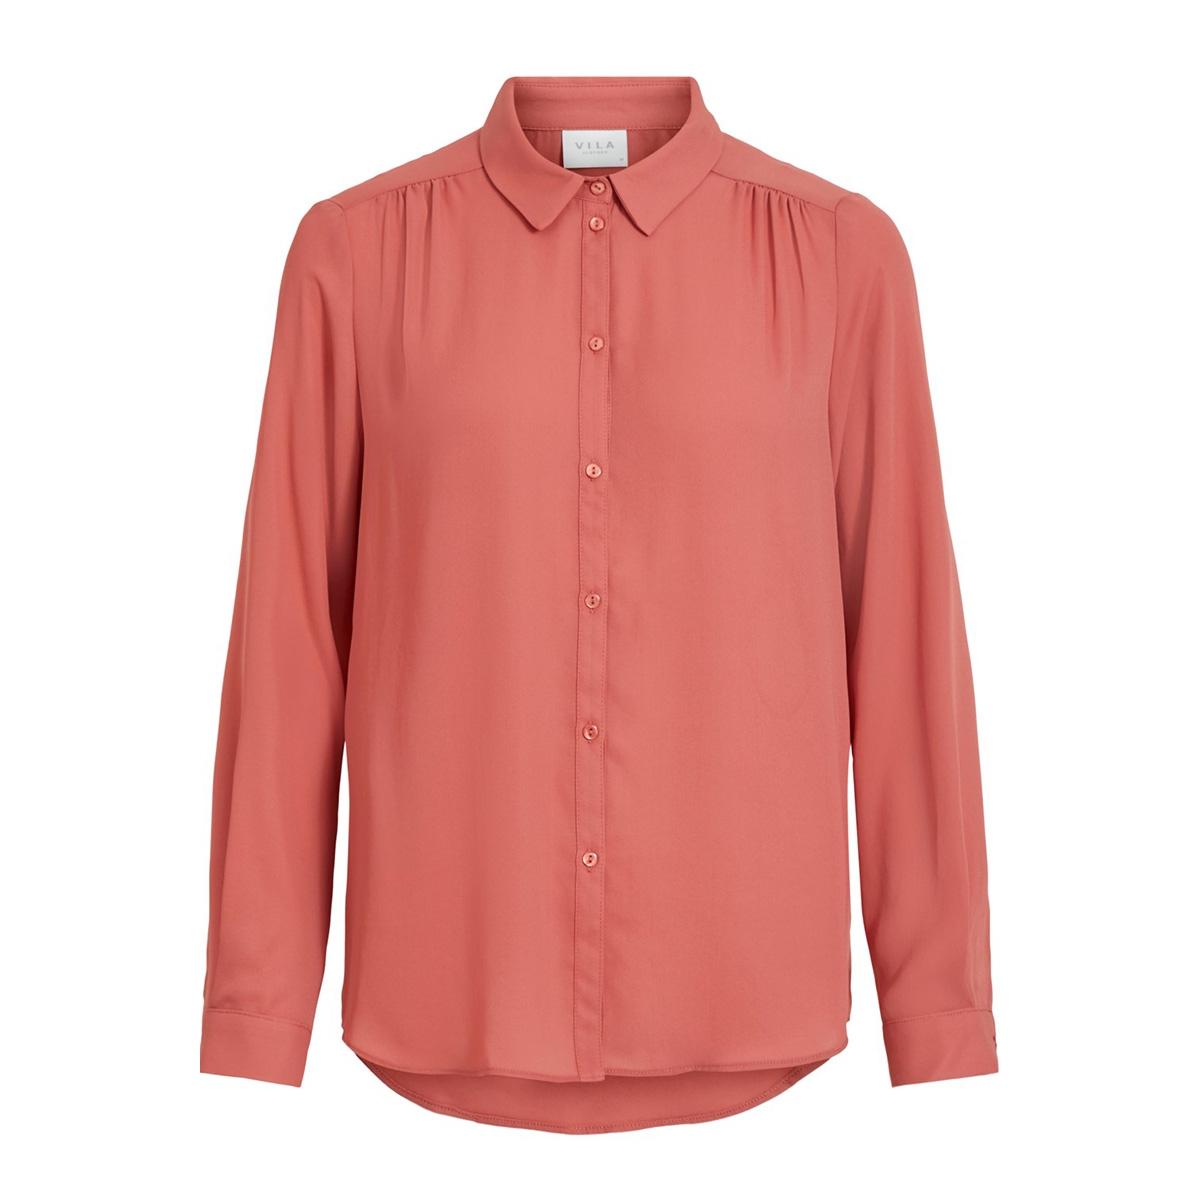 vilucy l/s button shirt - fav 14053374 vila blouse dusty cedar